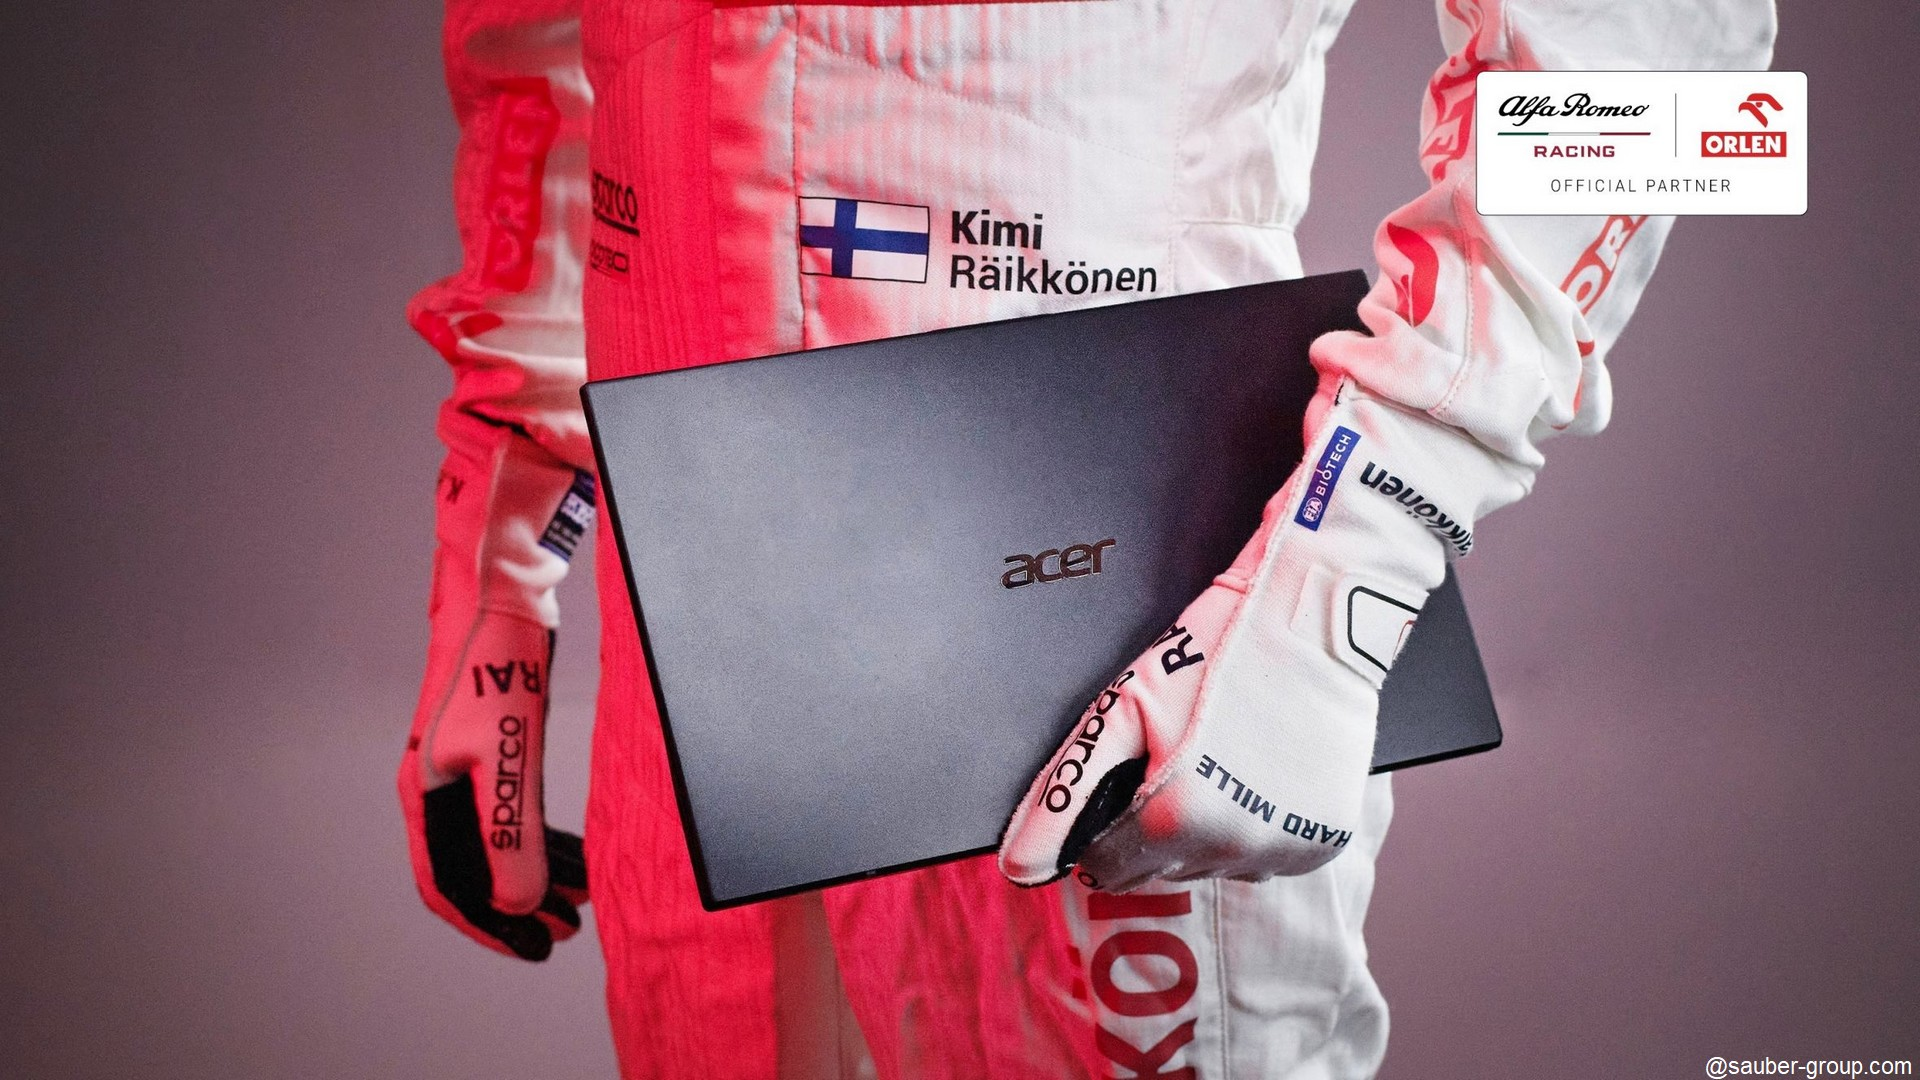 Acer x Alfa Romeo (Formule 1) 2021